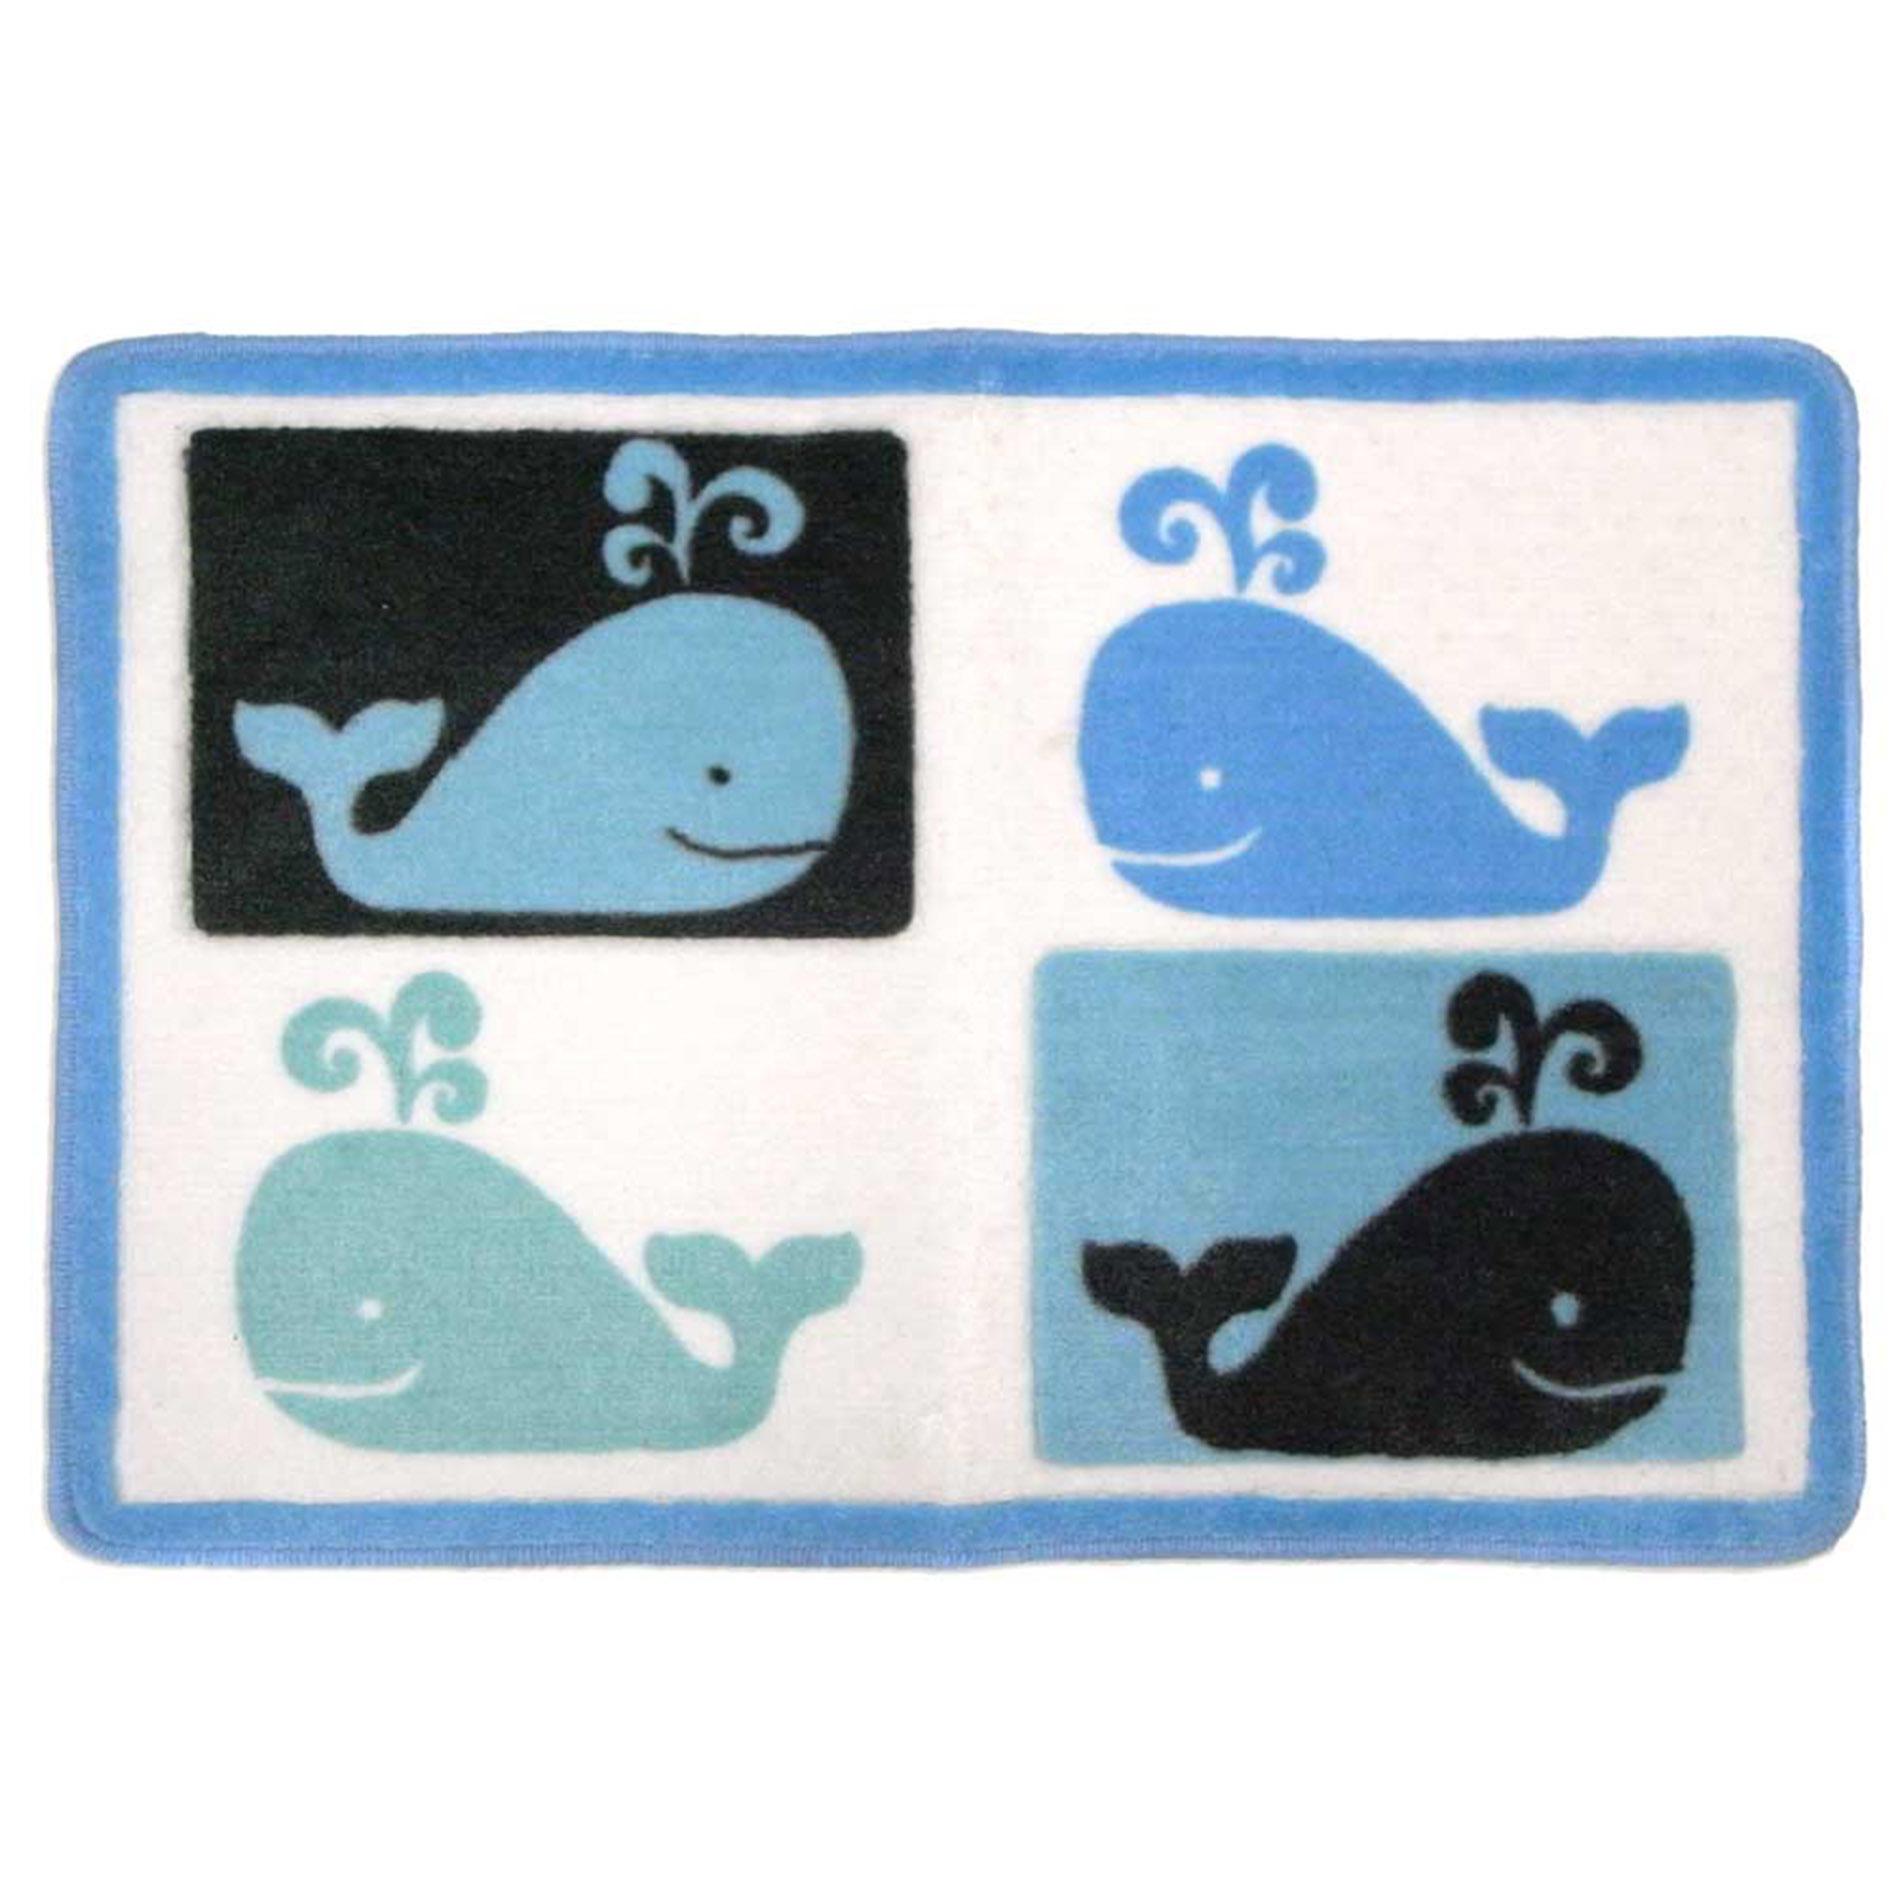 Whale Watch Bath Mat - Checkerboard PartNumber: 09623684000P KsnValue: 09623684000 MfgPartNumber: WHARU00